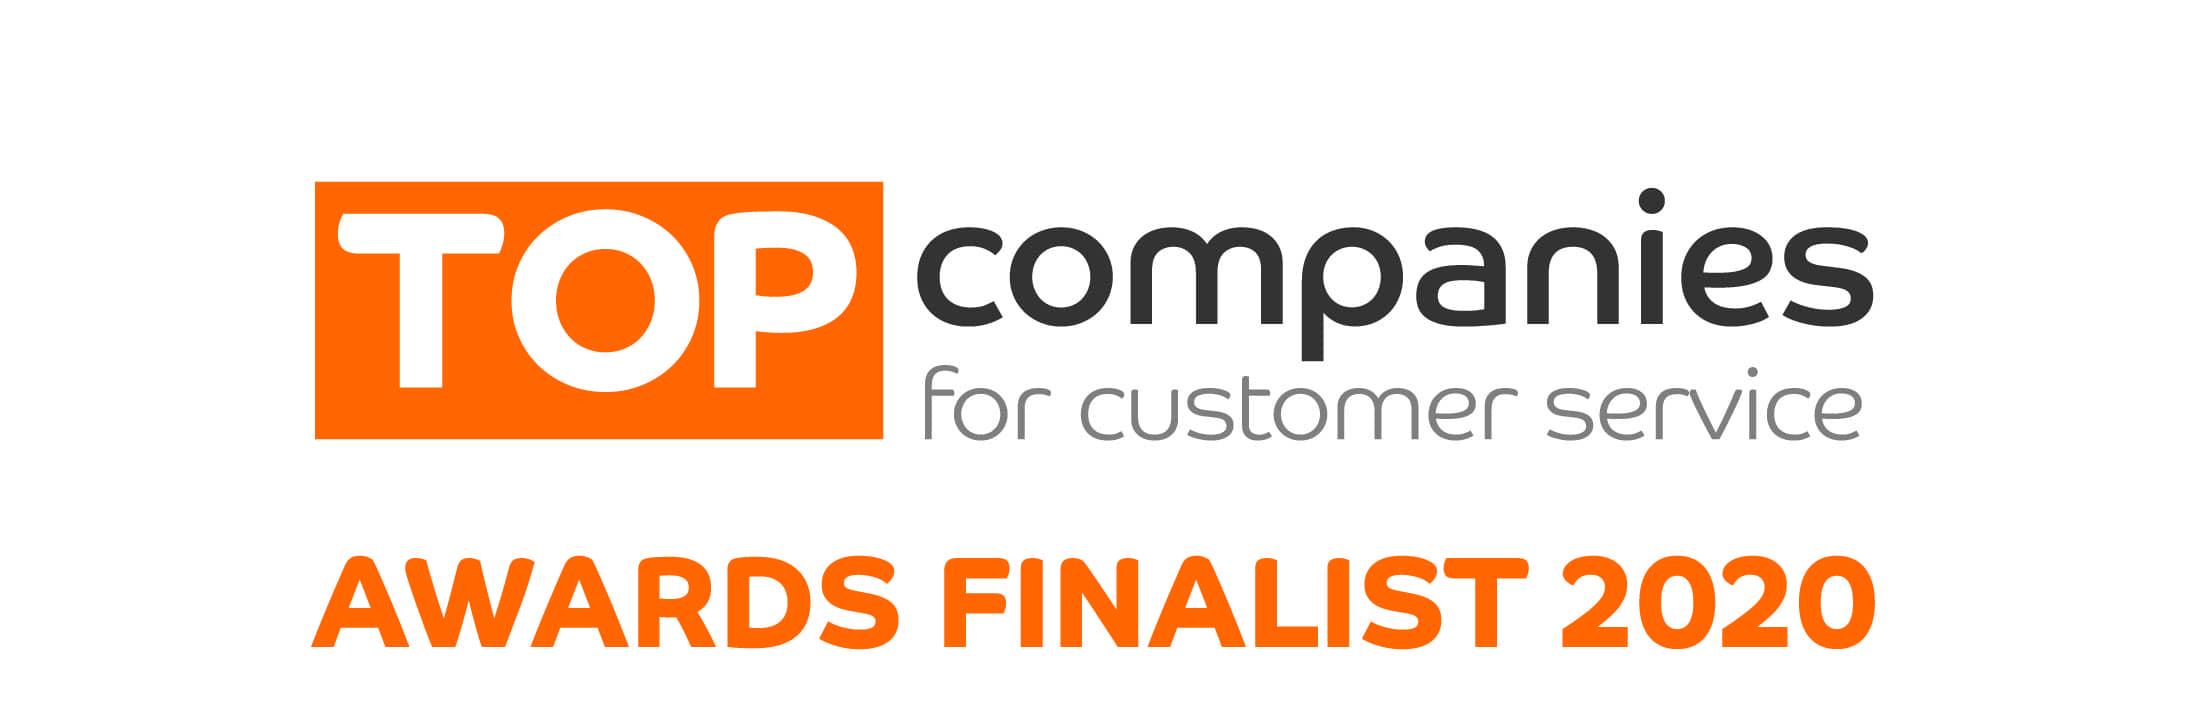 Top companies awards finalist 2020